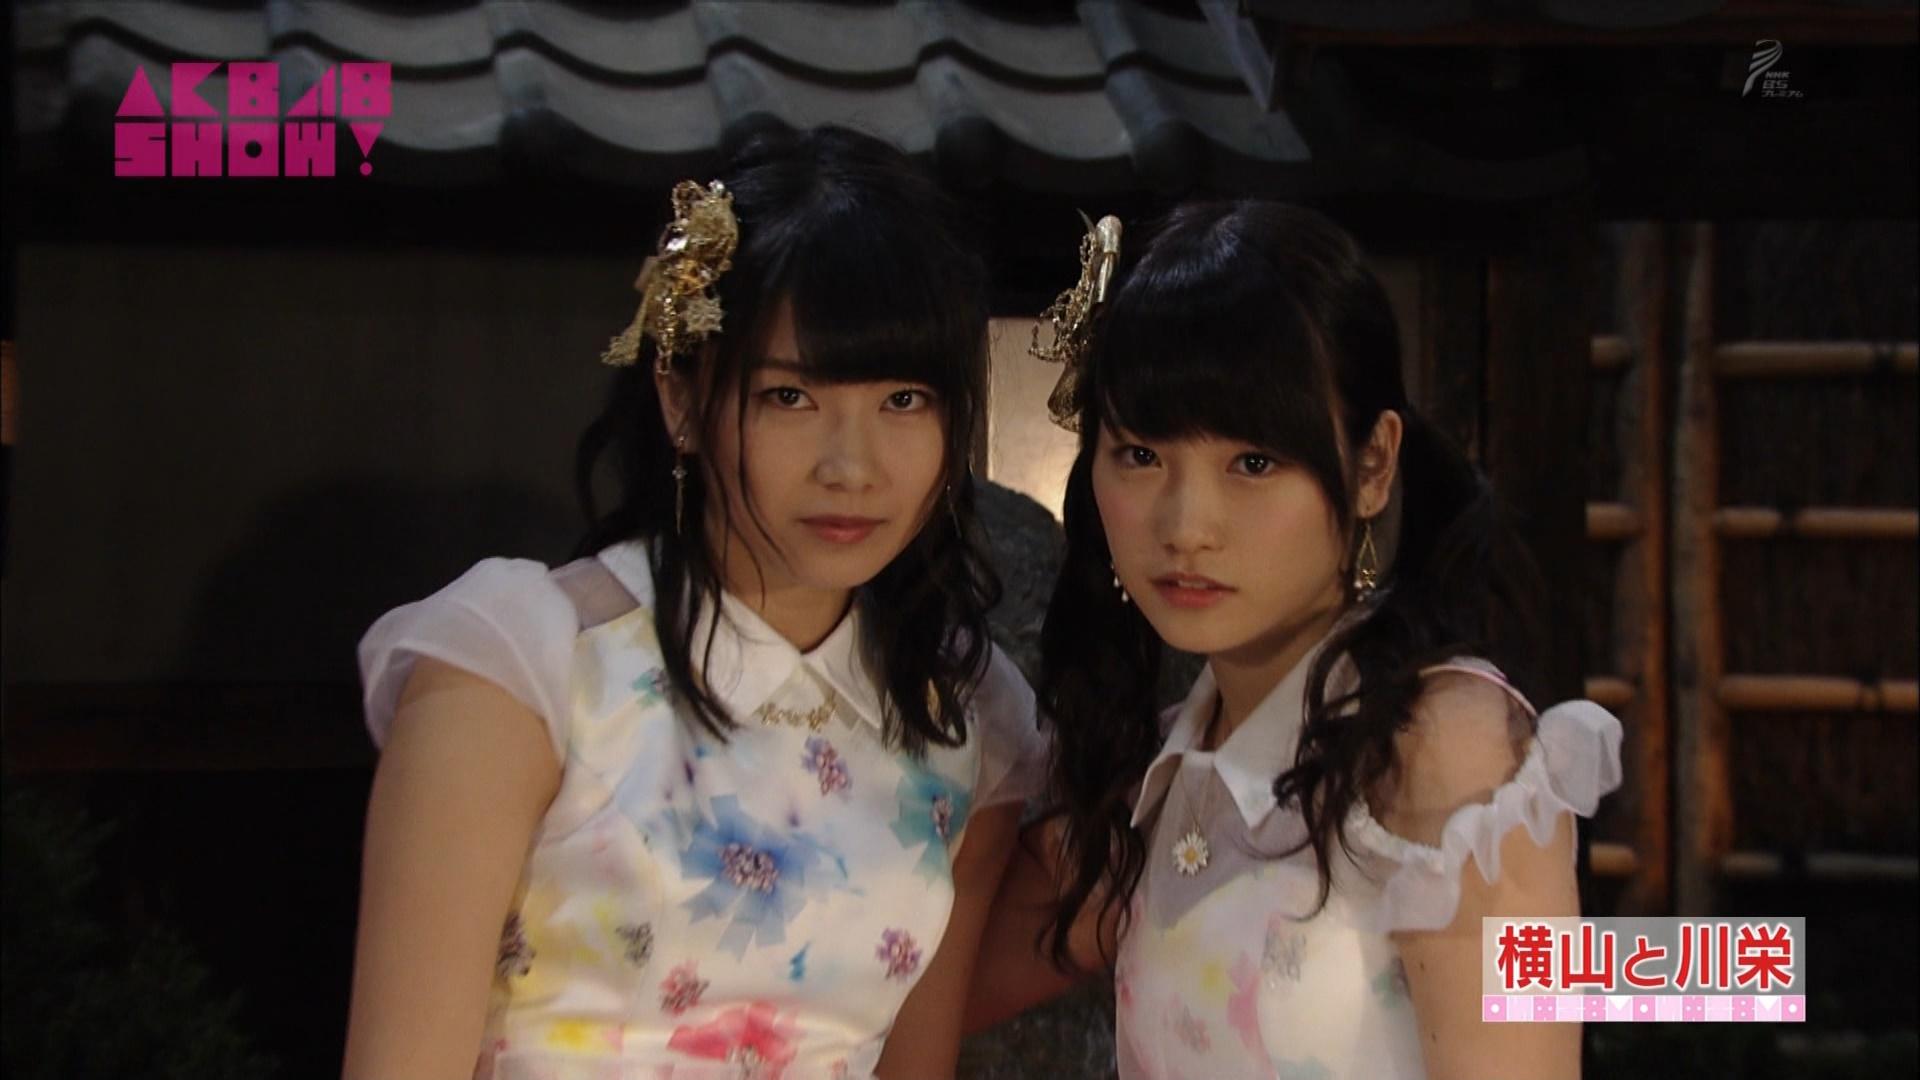 横山由依と川栄李奈 AKB48SHOW! 20140906 (64)